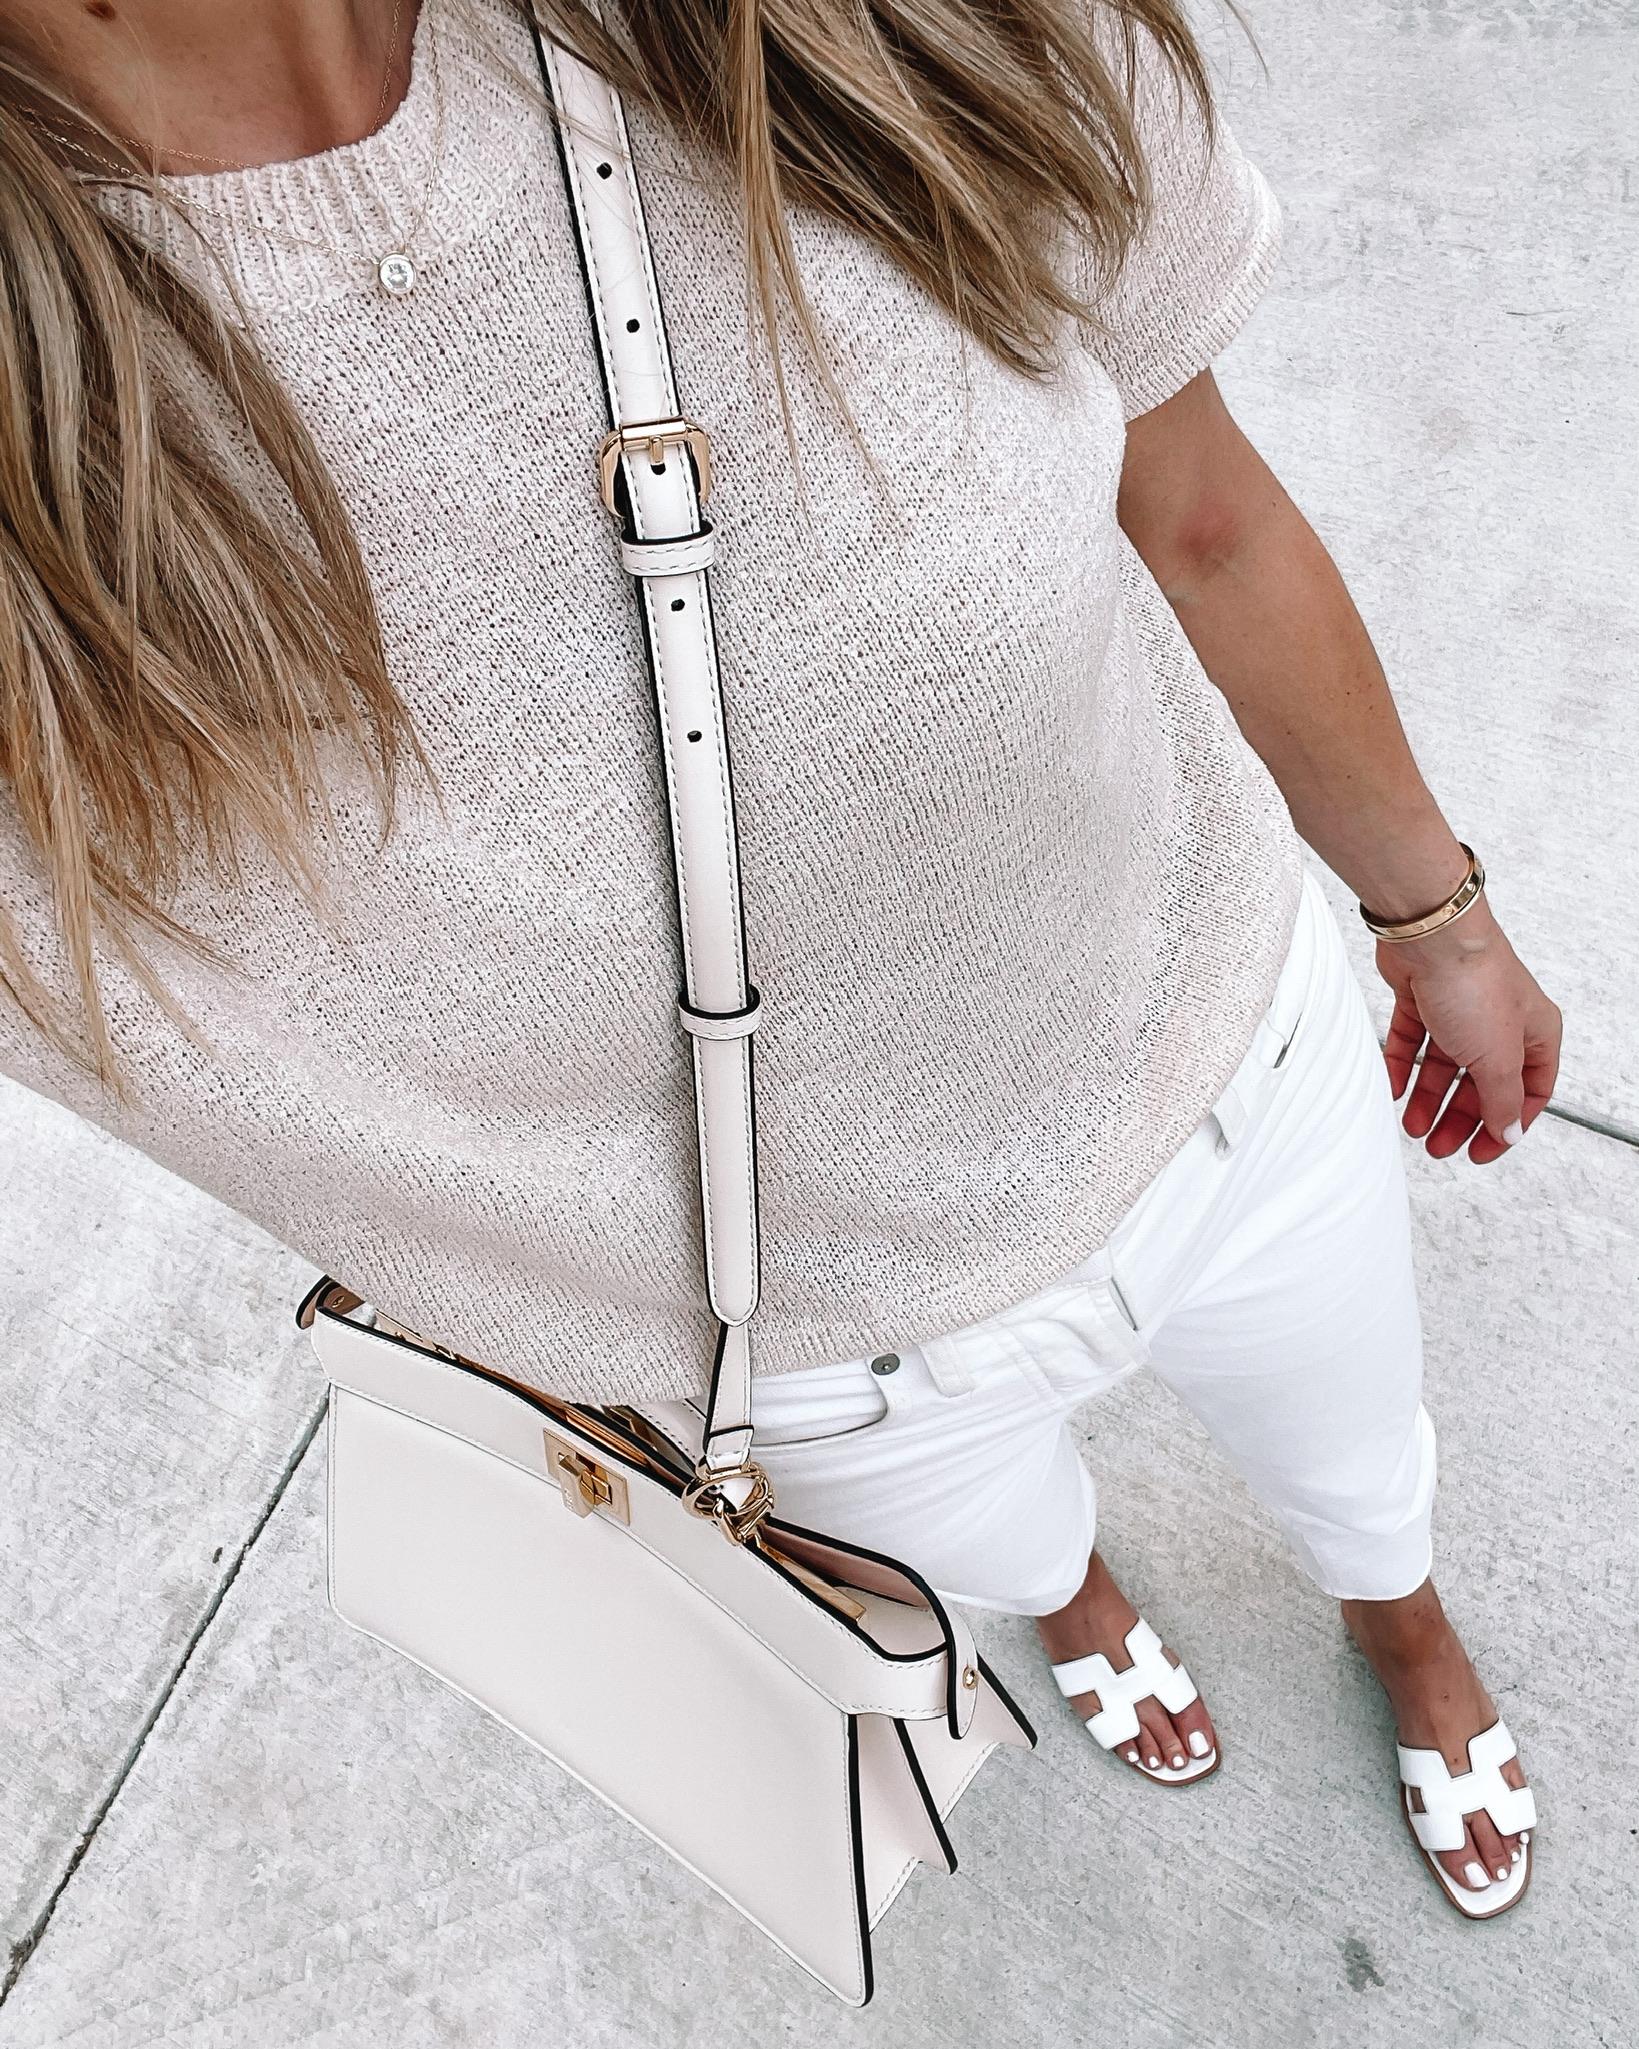 Fashion Jackson Wearing Amazon Fashion Beige Short Sleeve Sweater White Skinny Jeans Hermes White Sandals